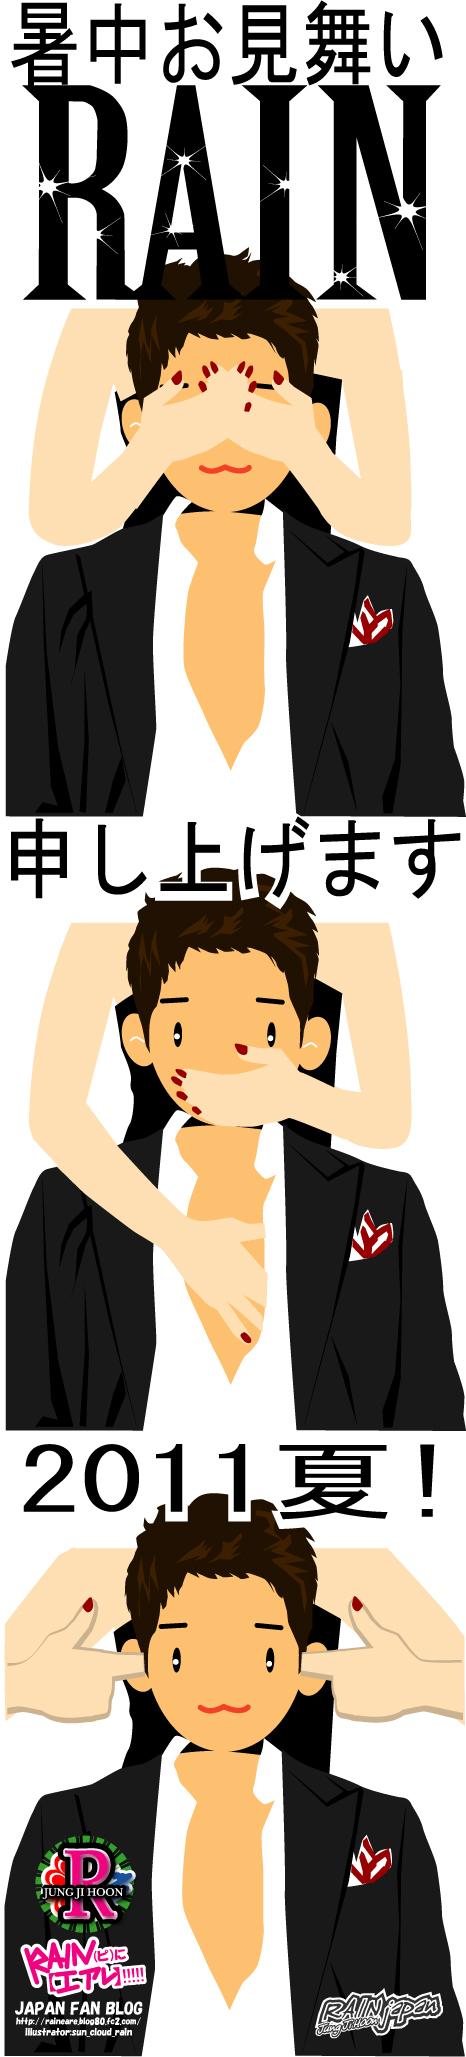 mizaruiwazarukikazaru.jpg